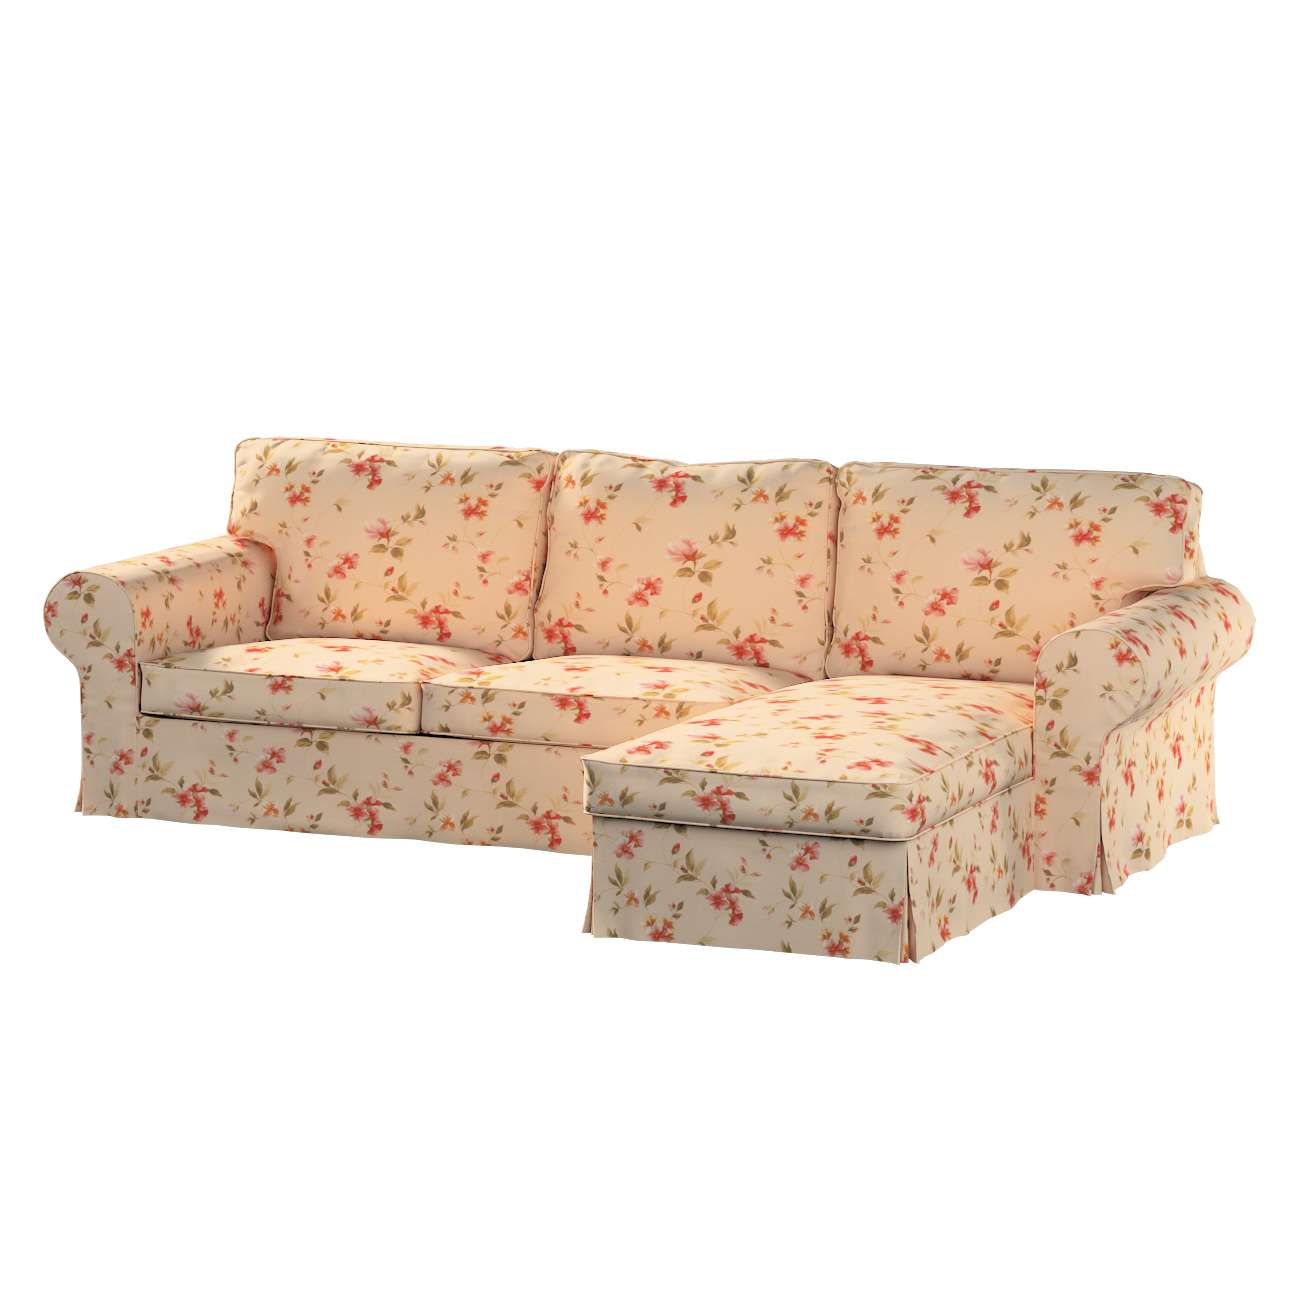 Ektorp 2-Sitzer Sofabezug mit Recamiere Ektorp 2-Sitzer Sofabezug mit Recamiere von der Kollektion Londres, Stoff: 124-05